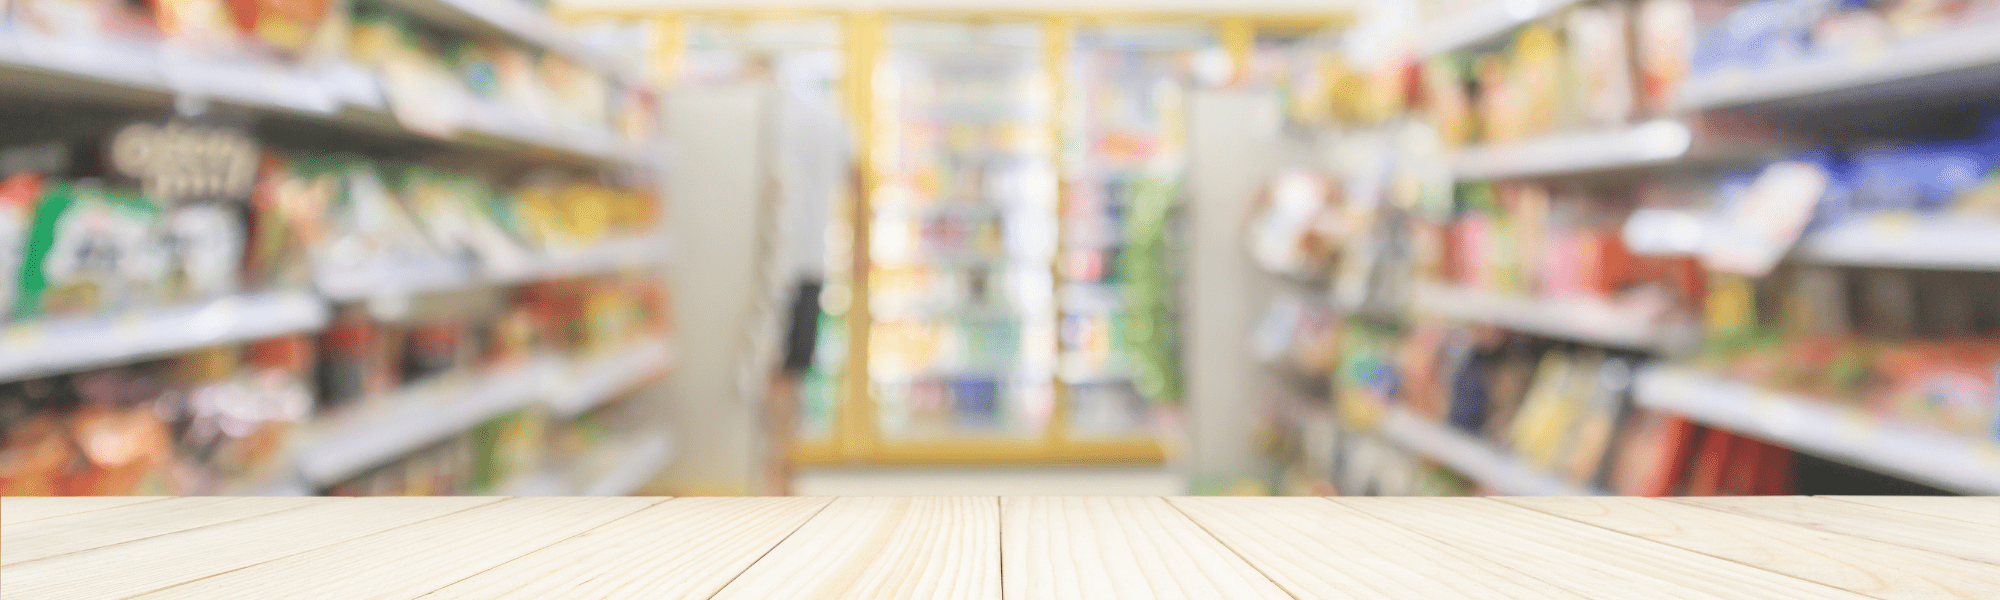 The Essential CStore (and CStore Distributors)